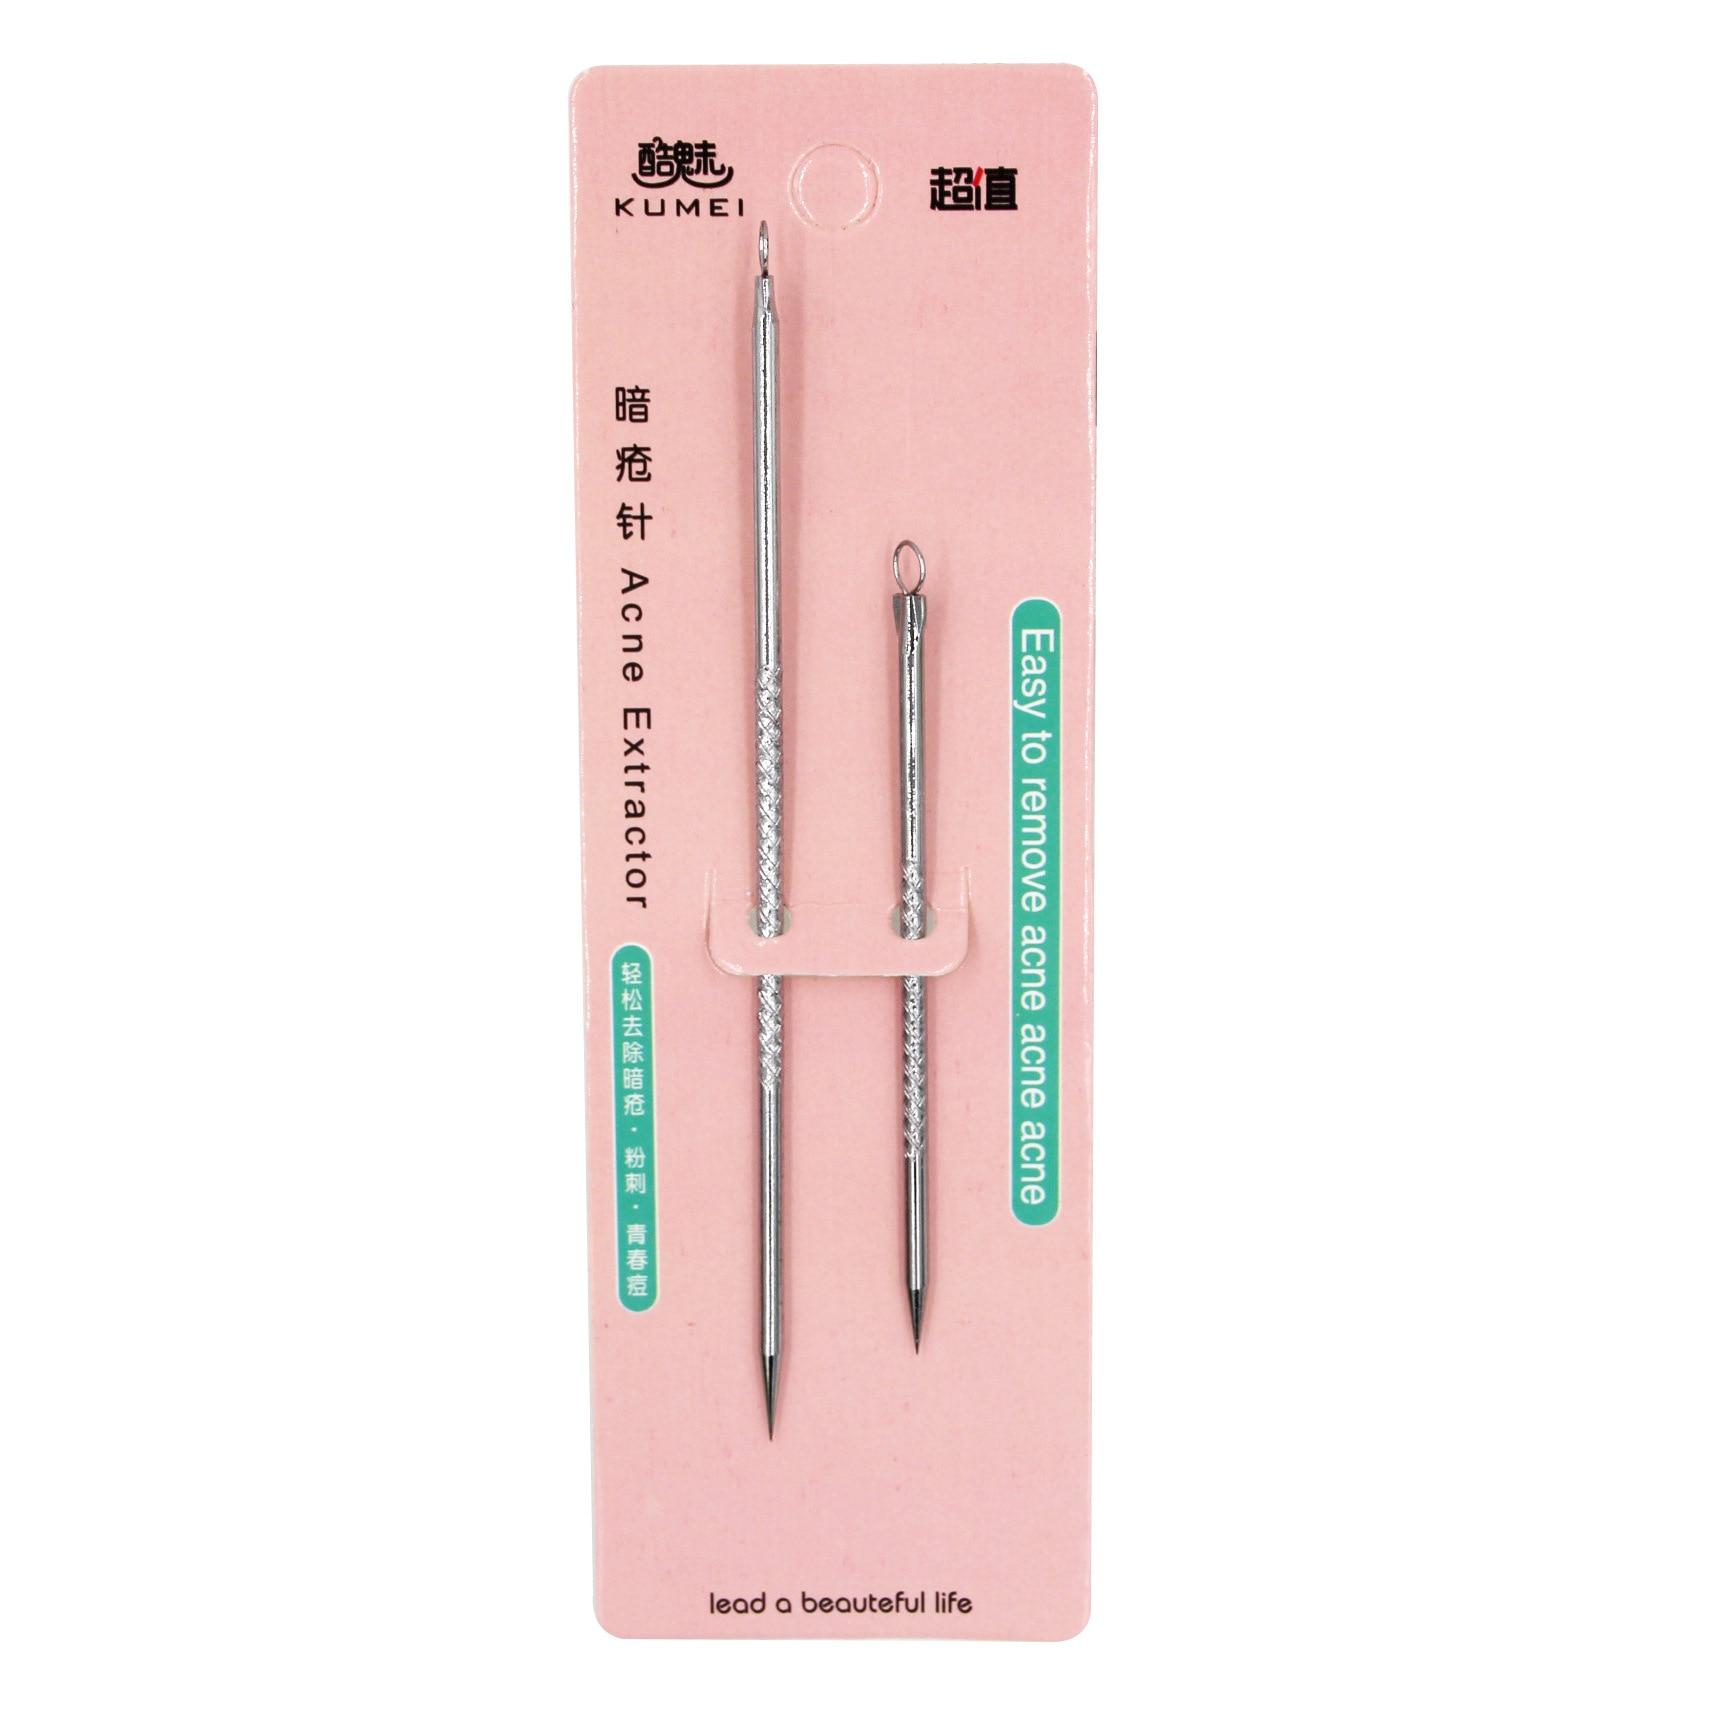 Acne Needle Set Stainless Steel Acne Needle Beauty Only Beauty Needle Remove Blackhead Pick Pox Stick 8310